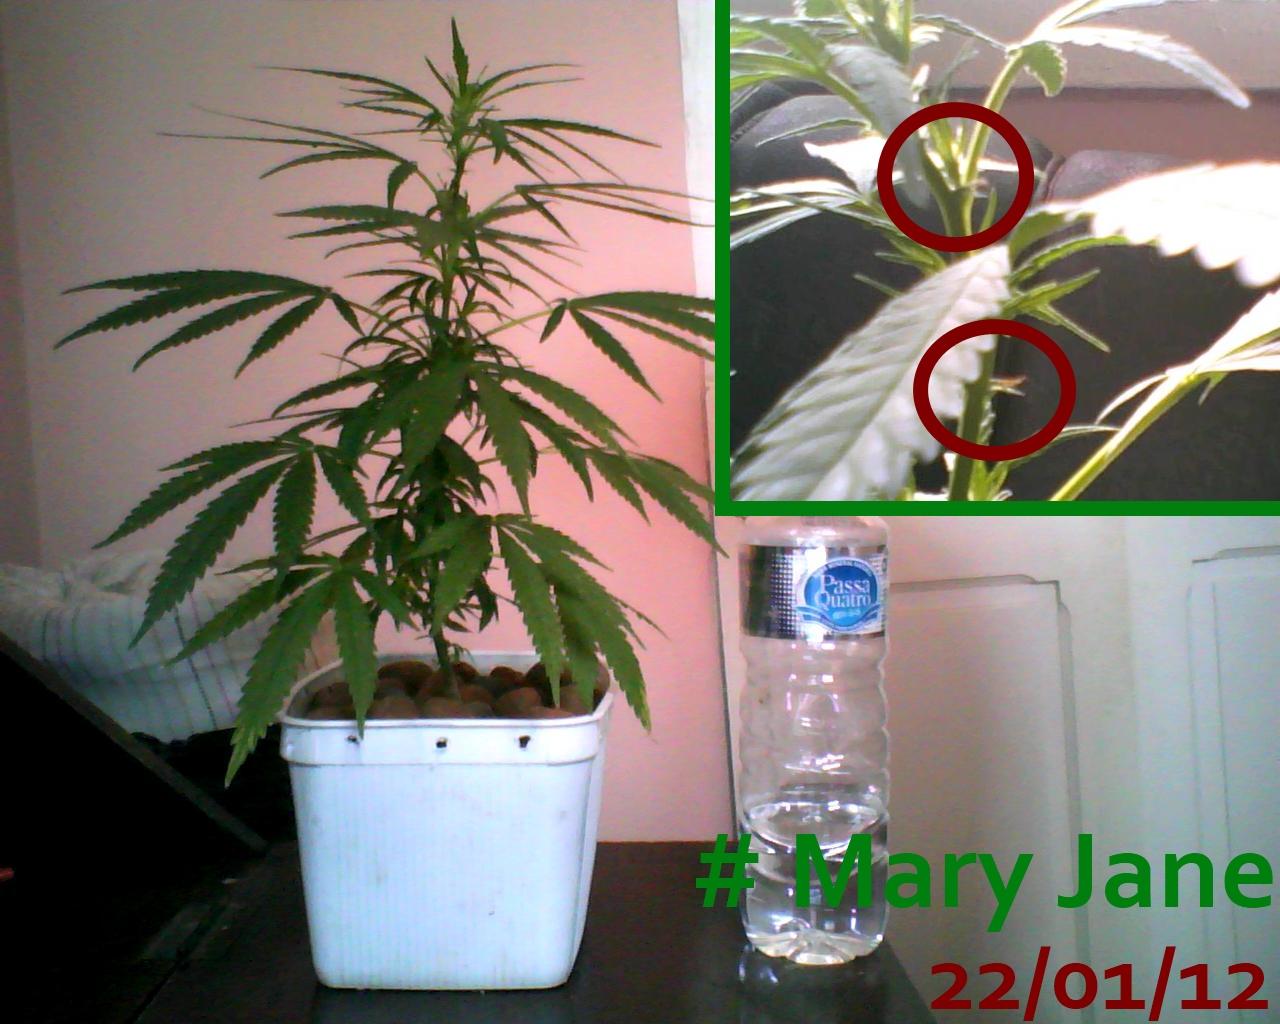 Mary Jane 22/01/12